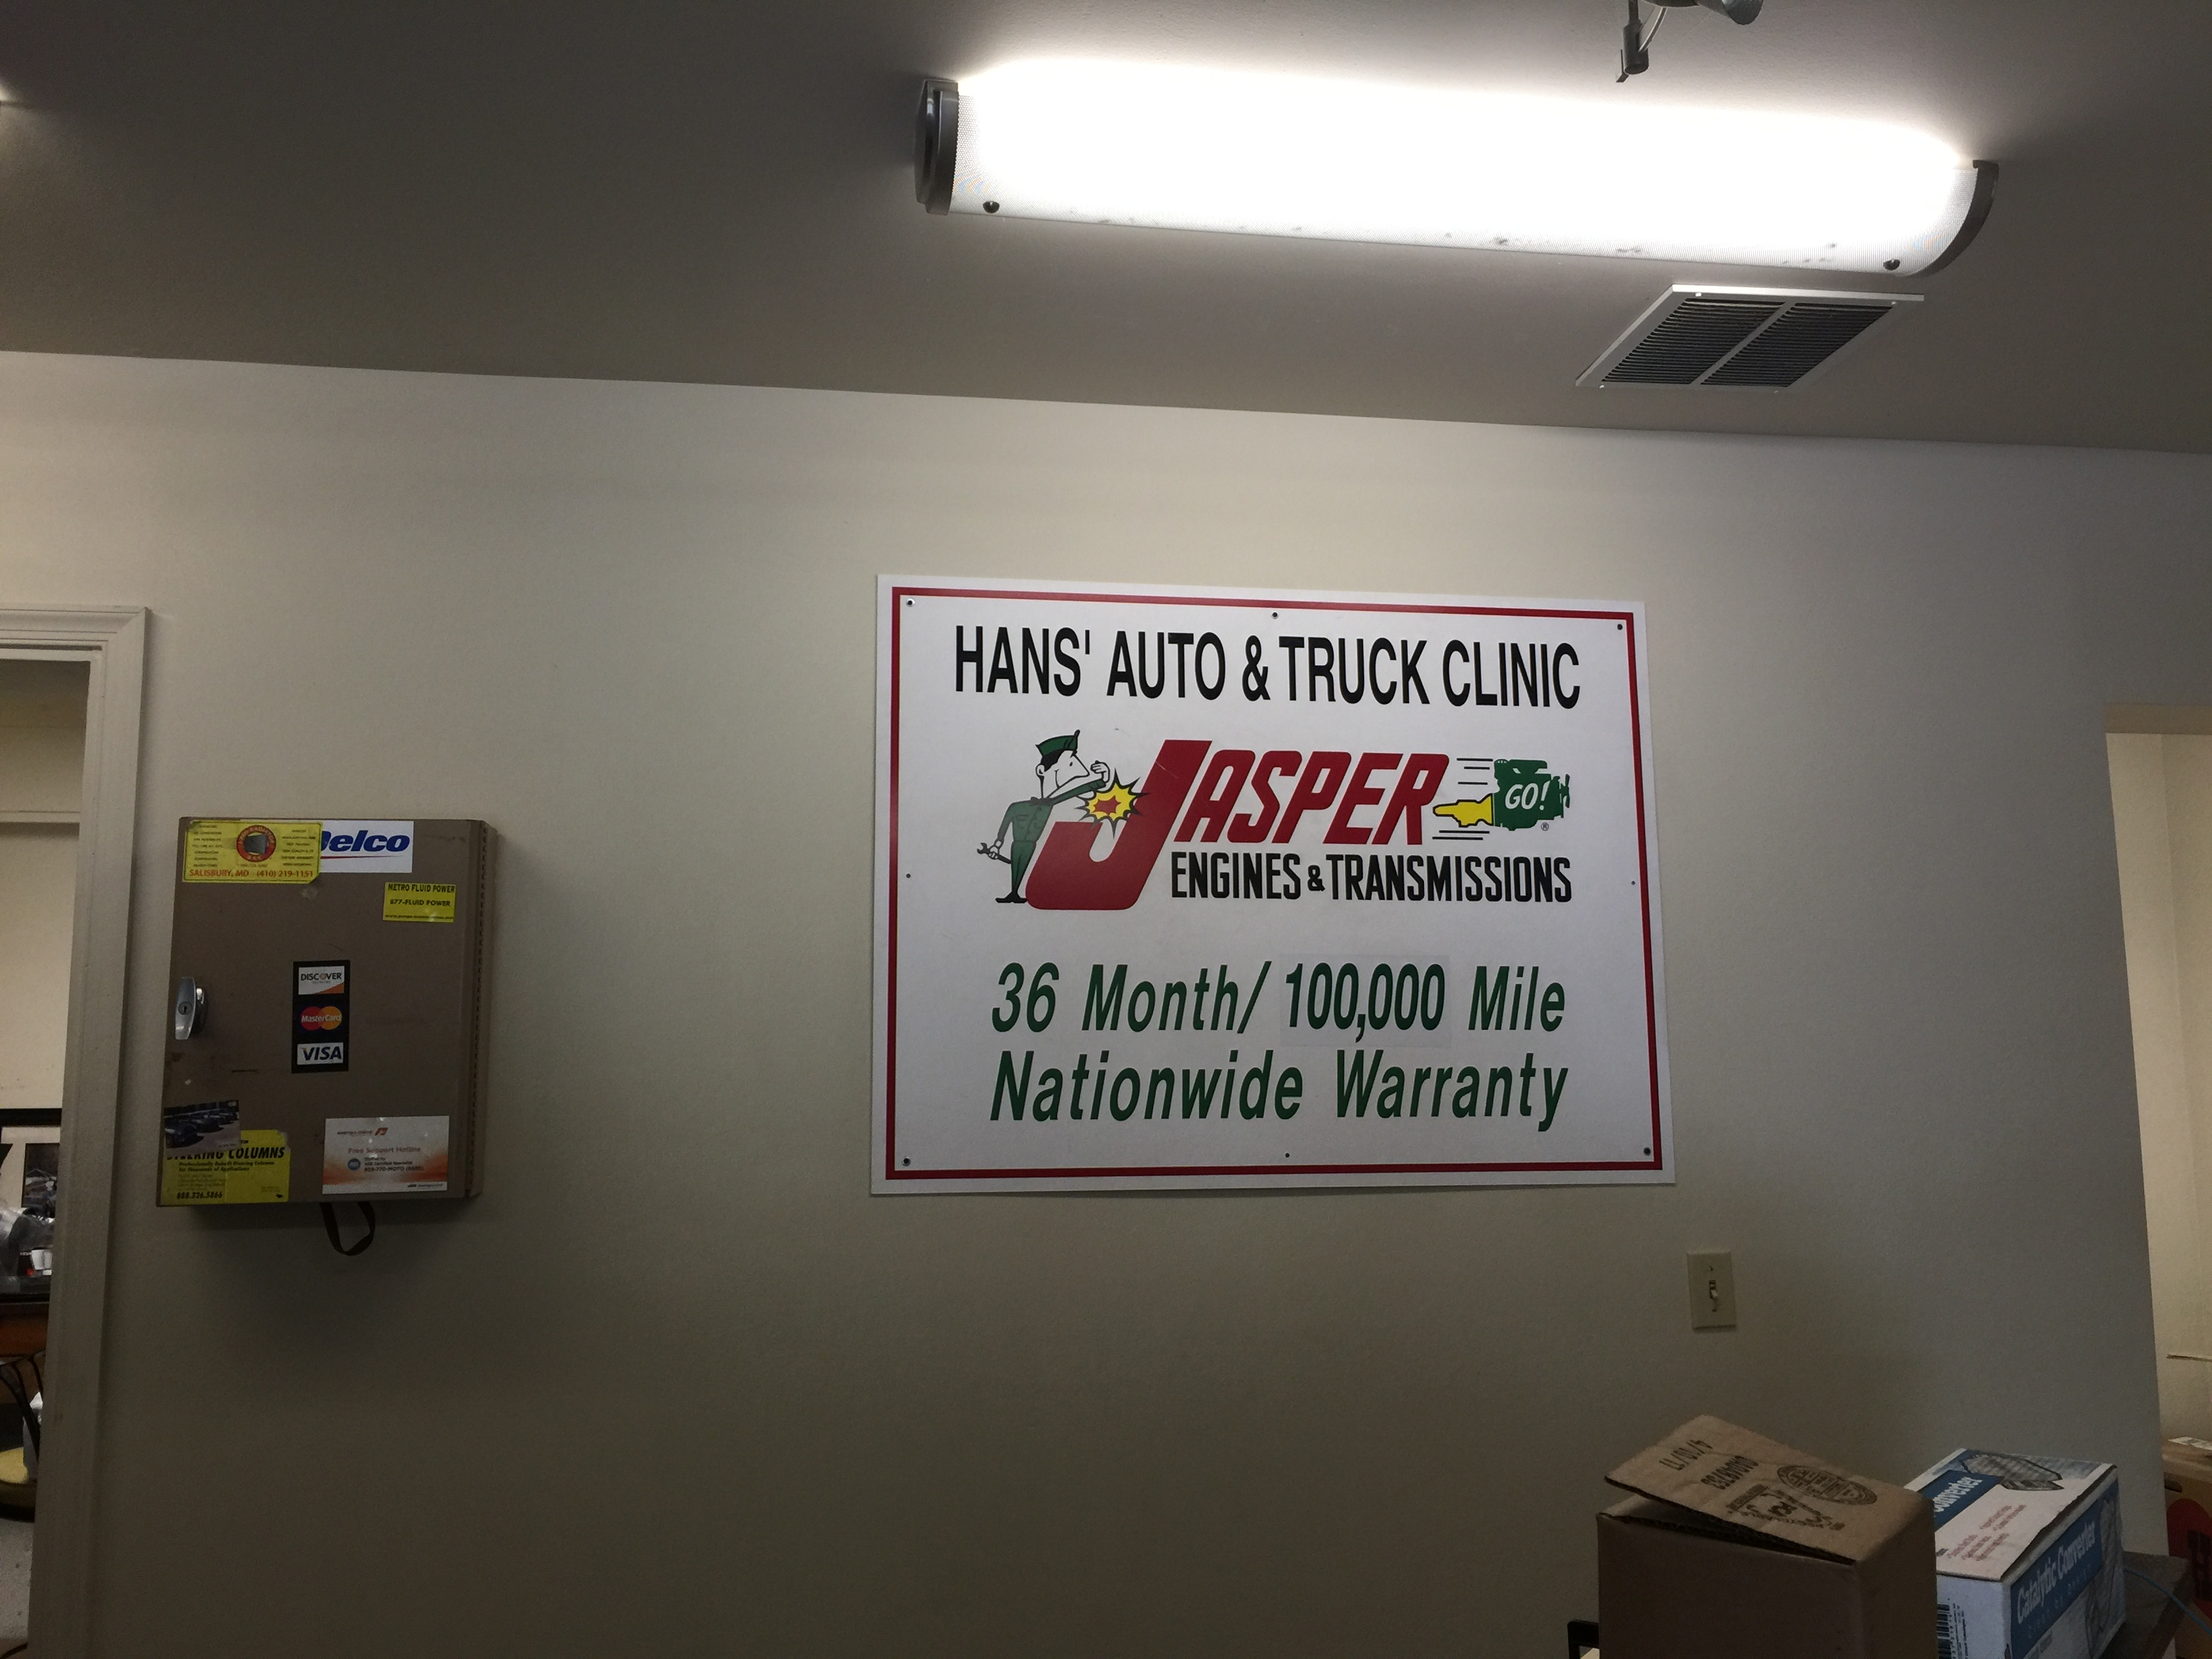 Hans' Auto & Truck Clinic image 0